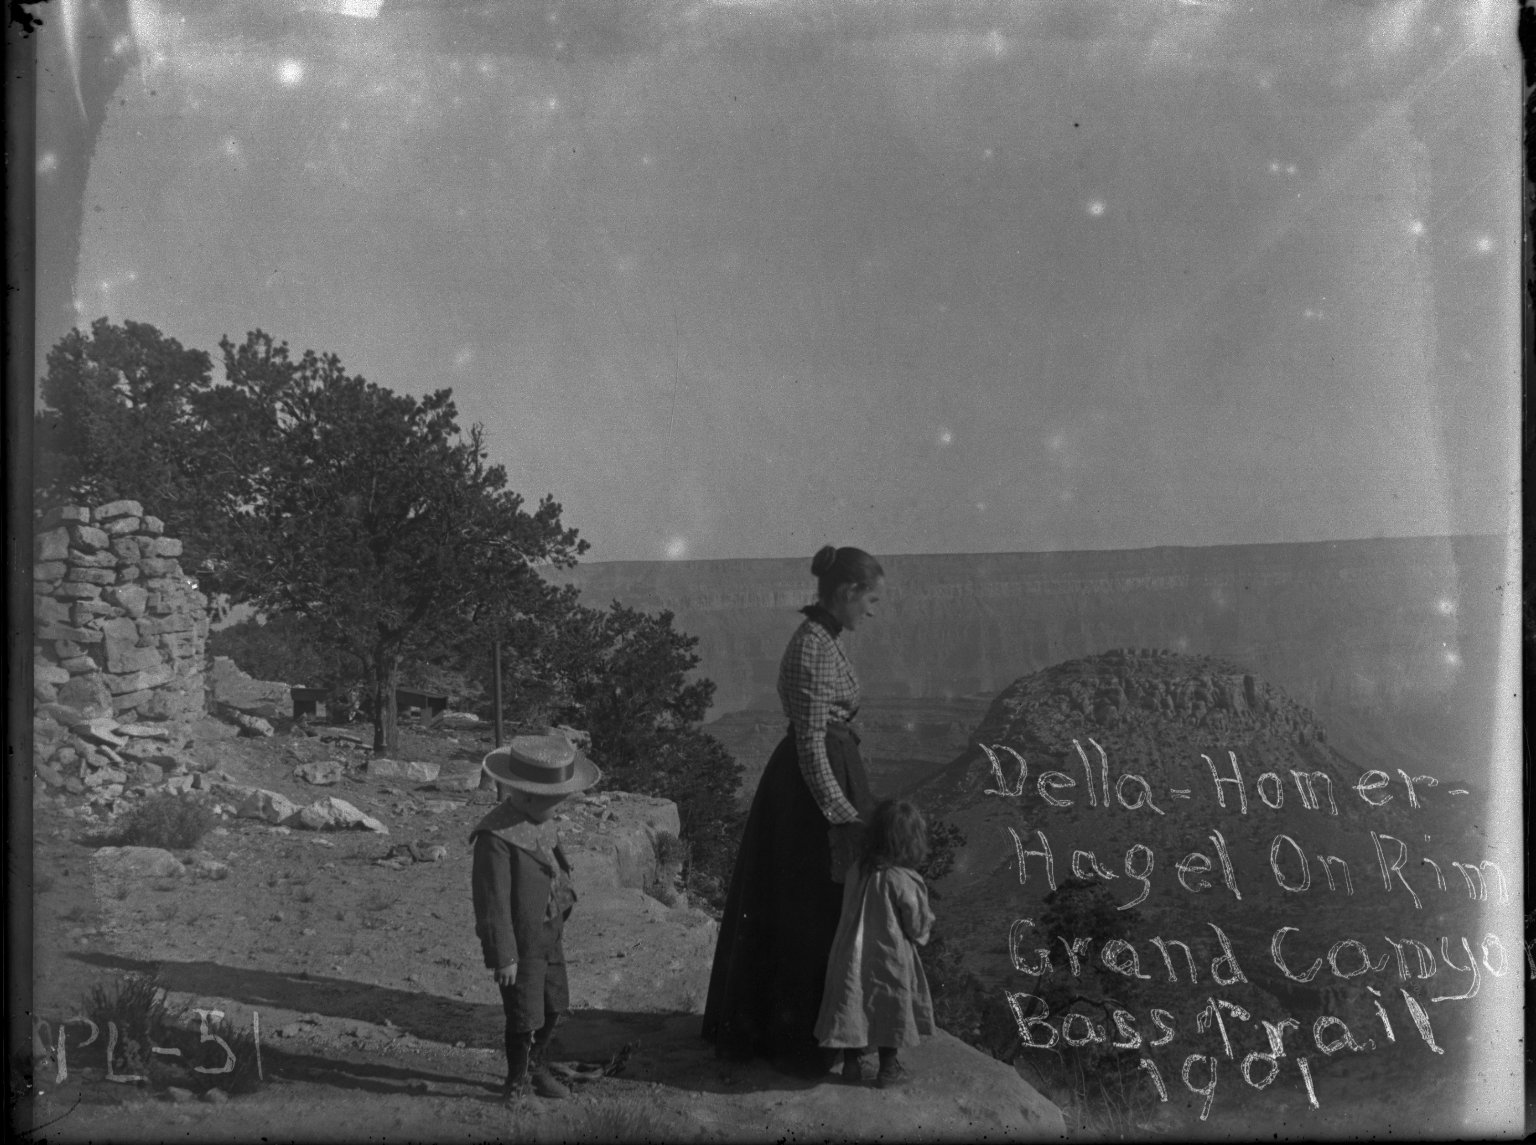 Della, Homer & Hazel at Head of Basses Trail